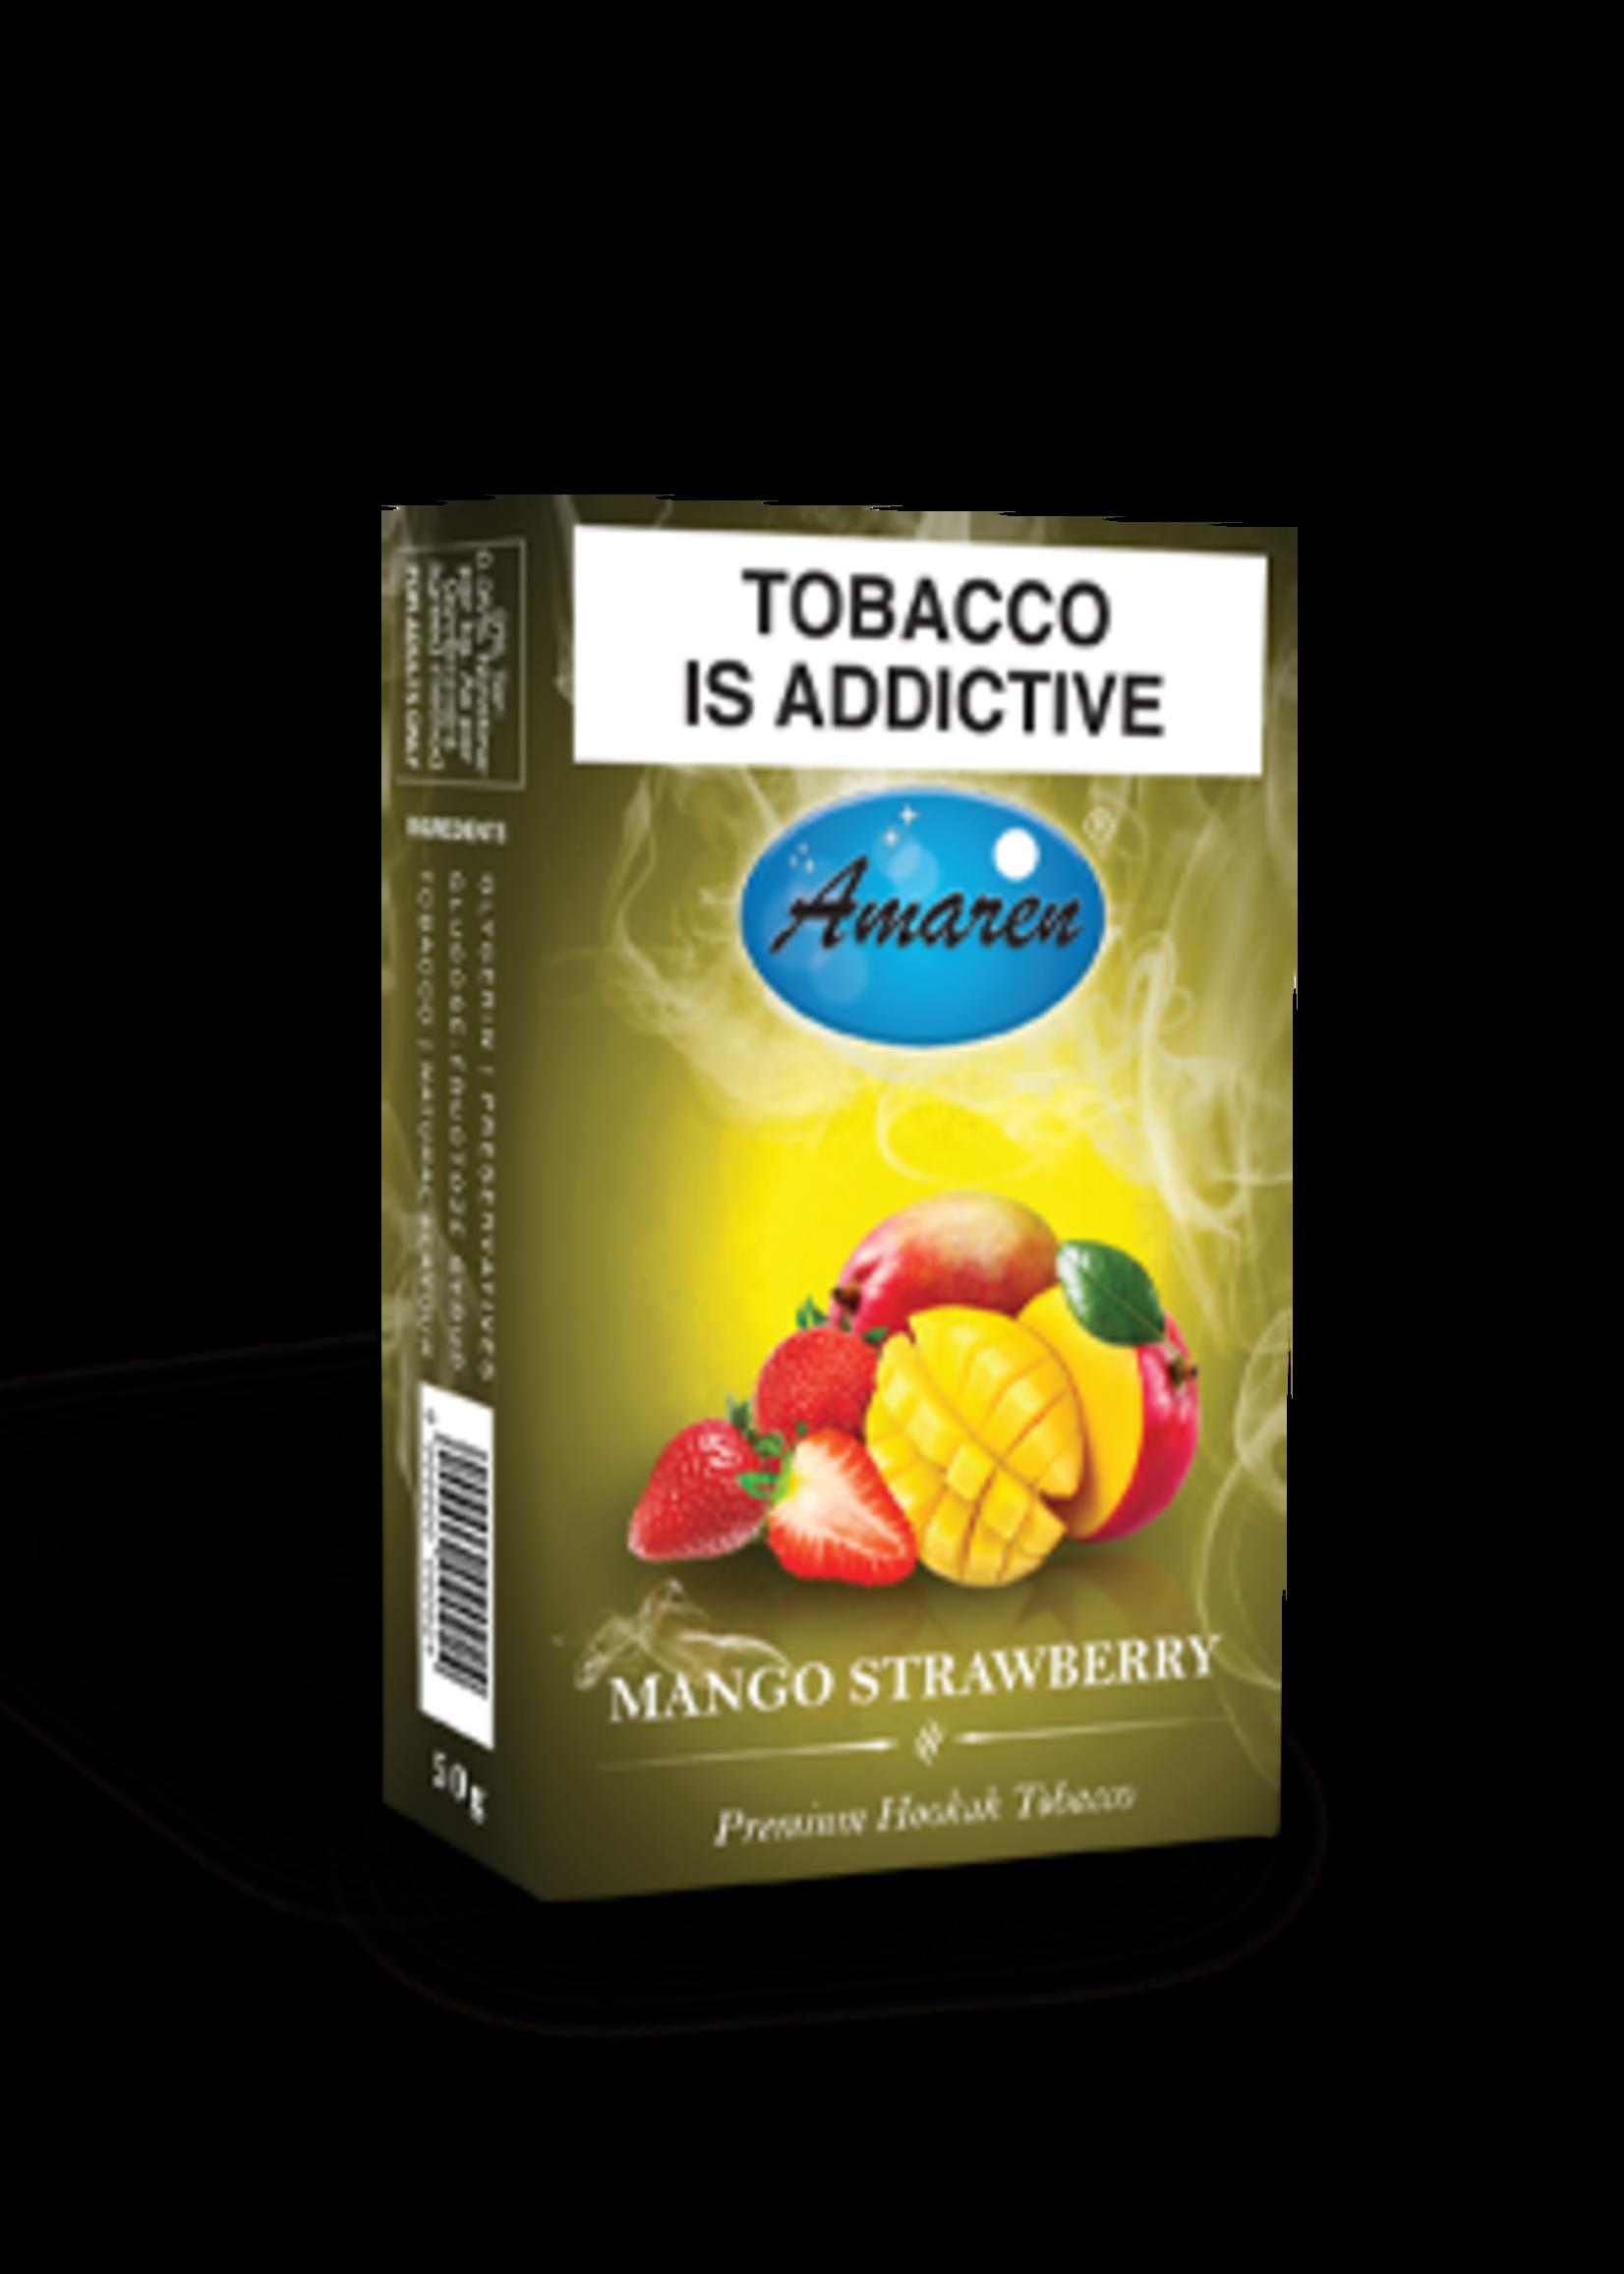 Amaren hubbly flavour - mango strawberry